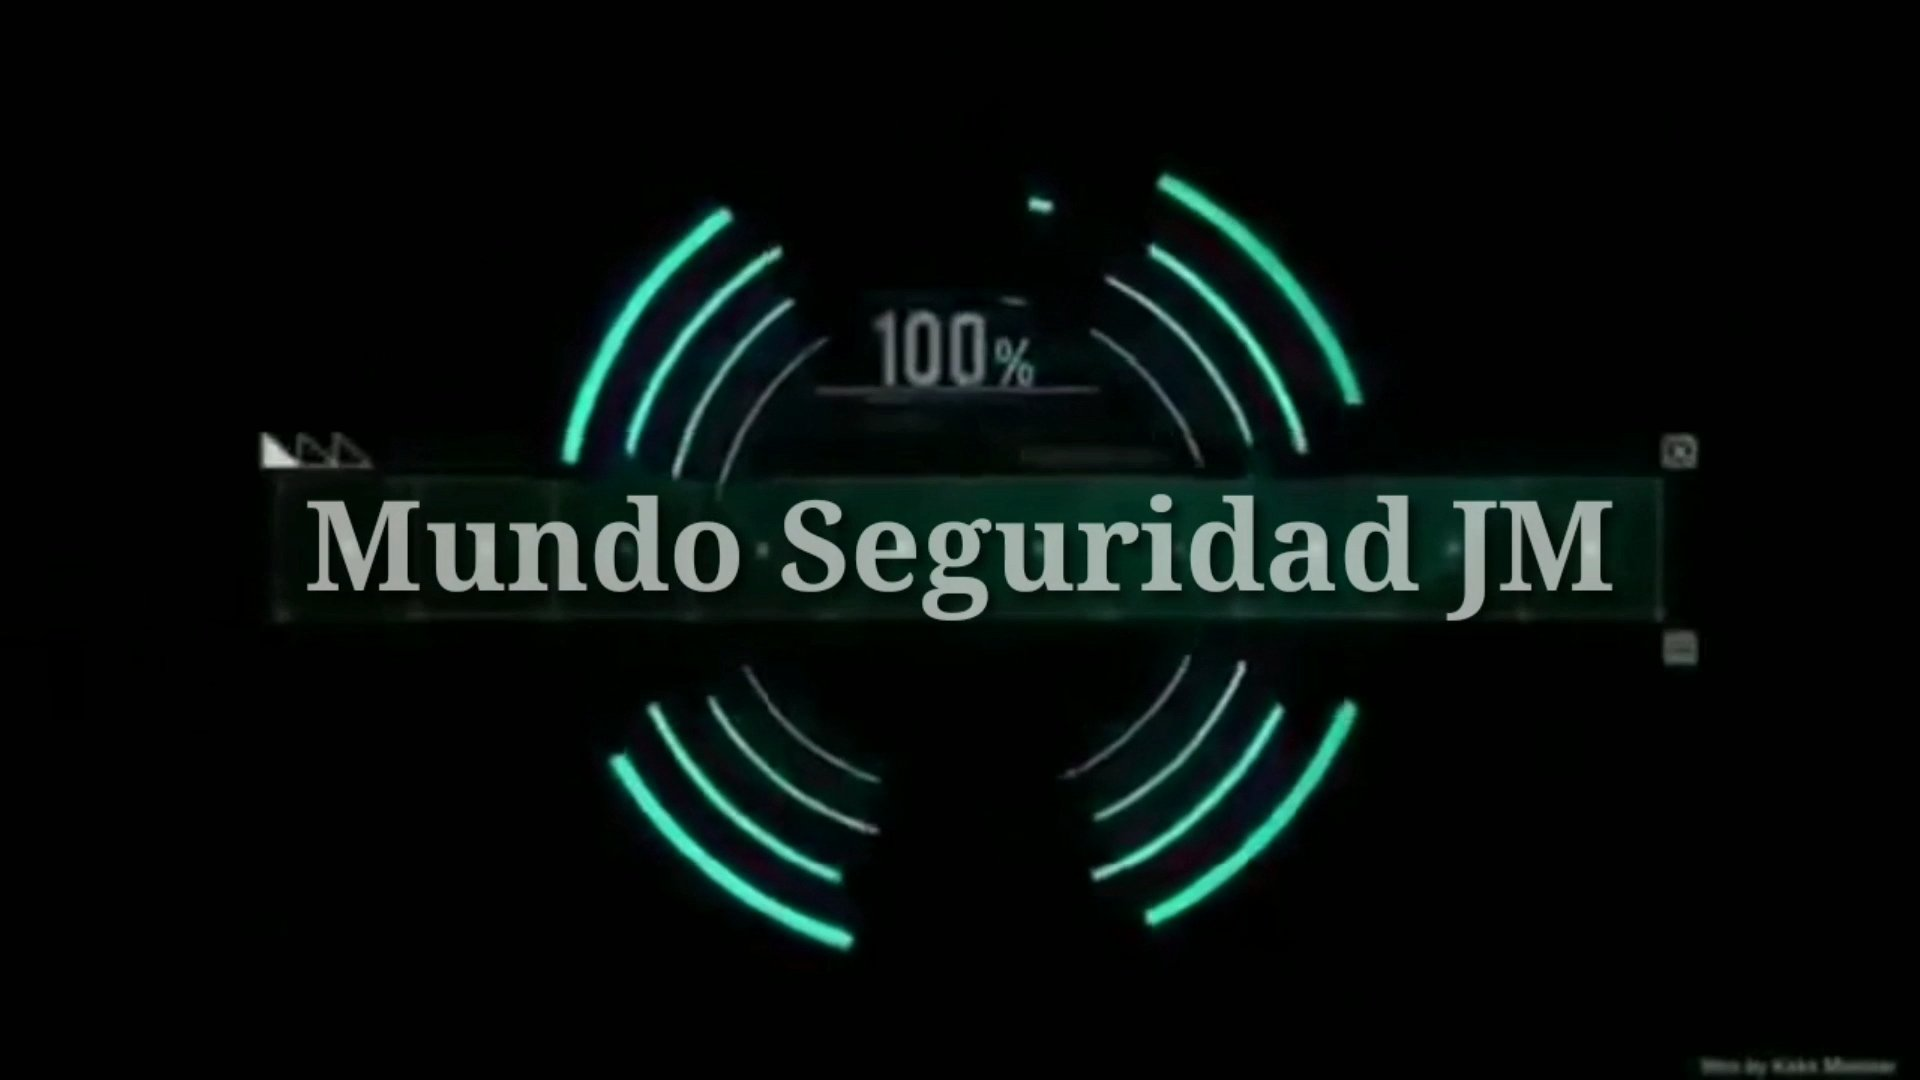 MUNDO SEGURIDAD JM